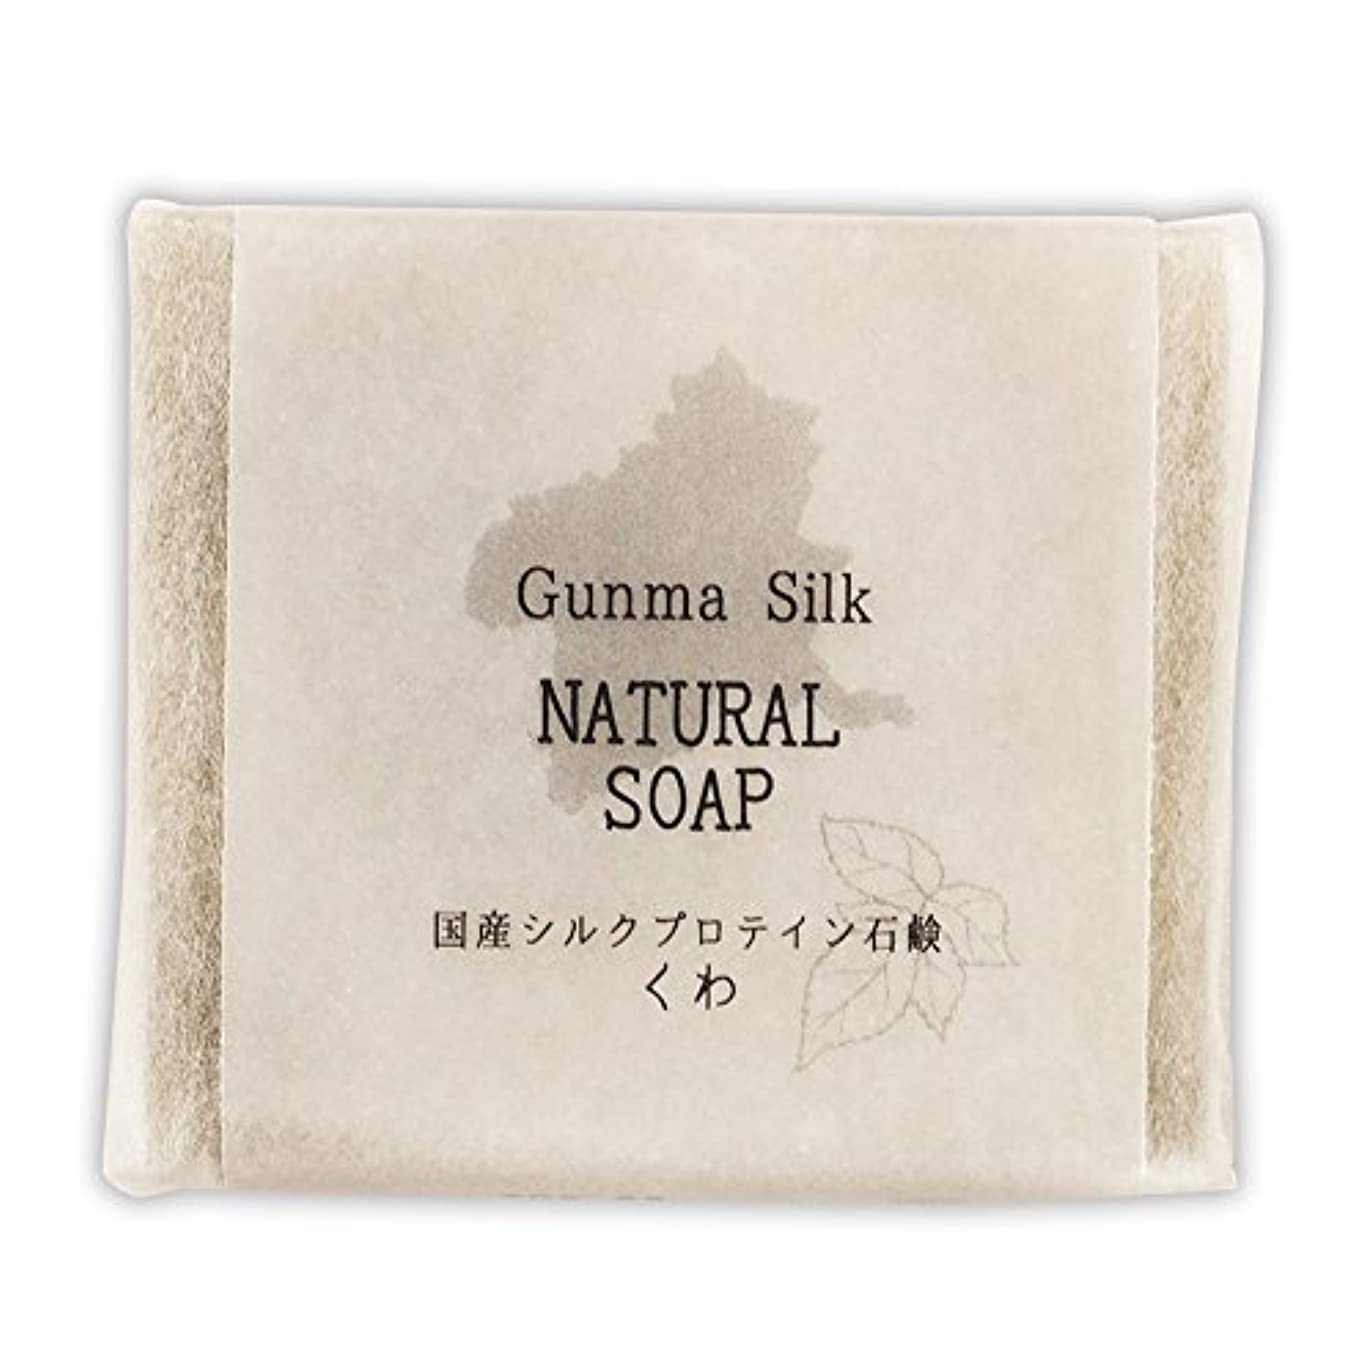 BN 国産シルクプロテイン石鹸 くわ SKS-03 (1個)